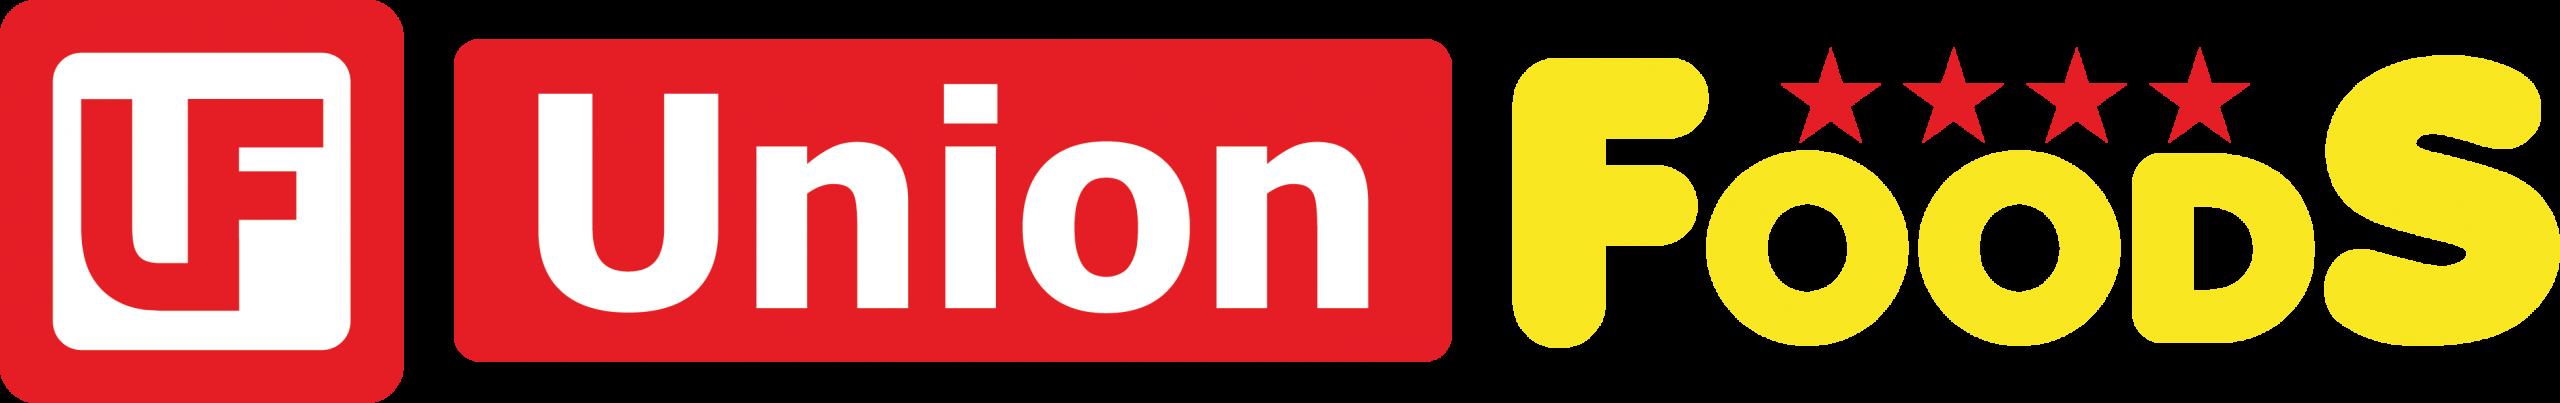 Union Foods d.o.o.